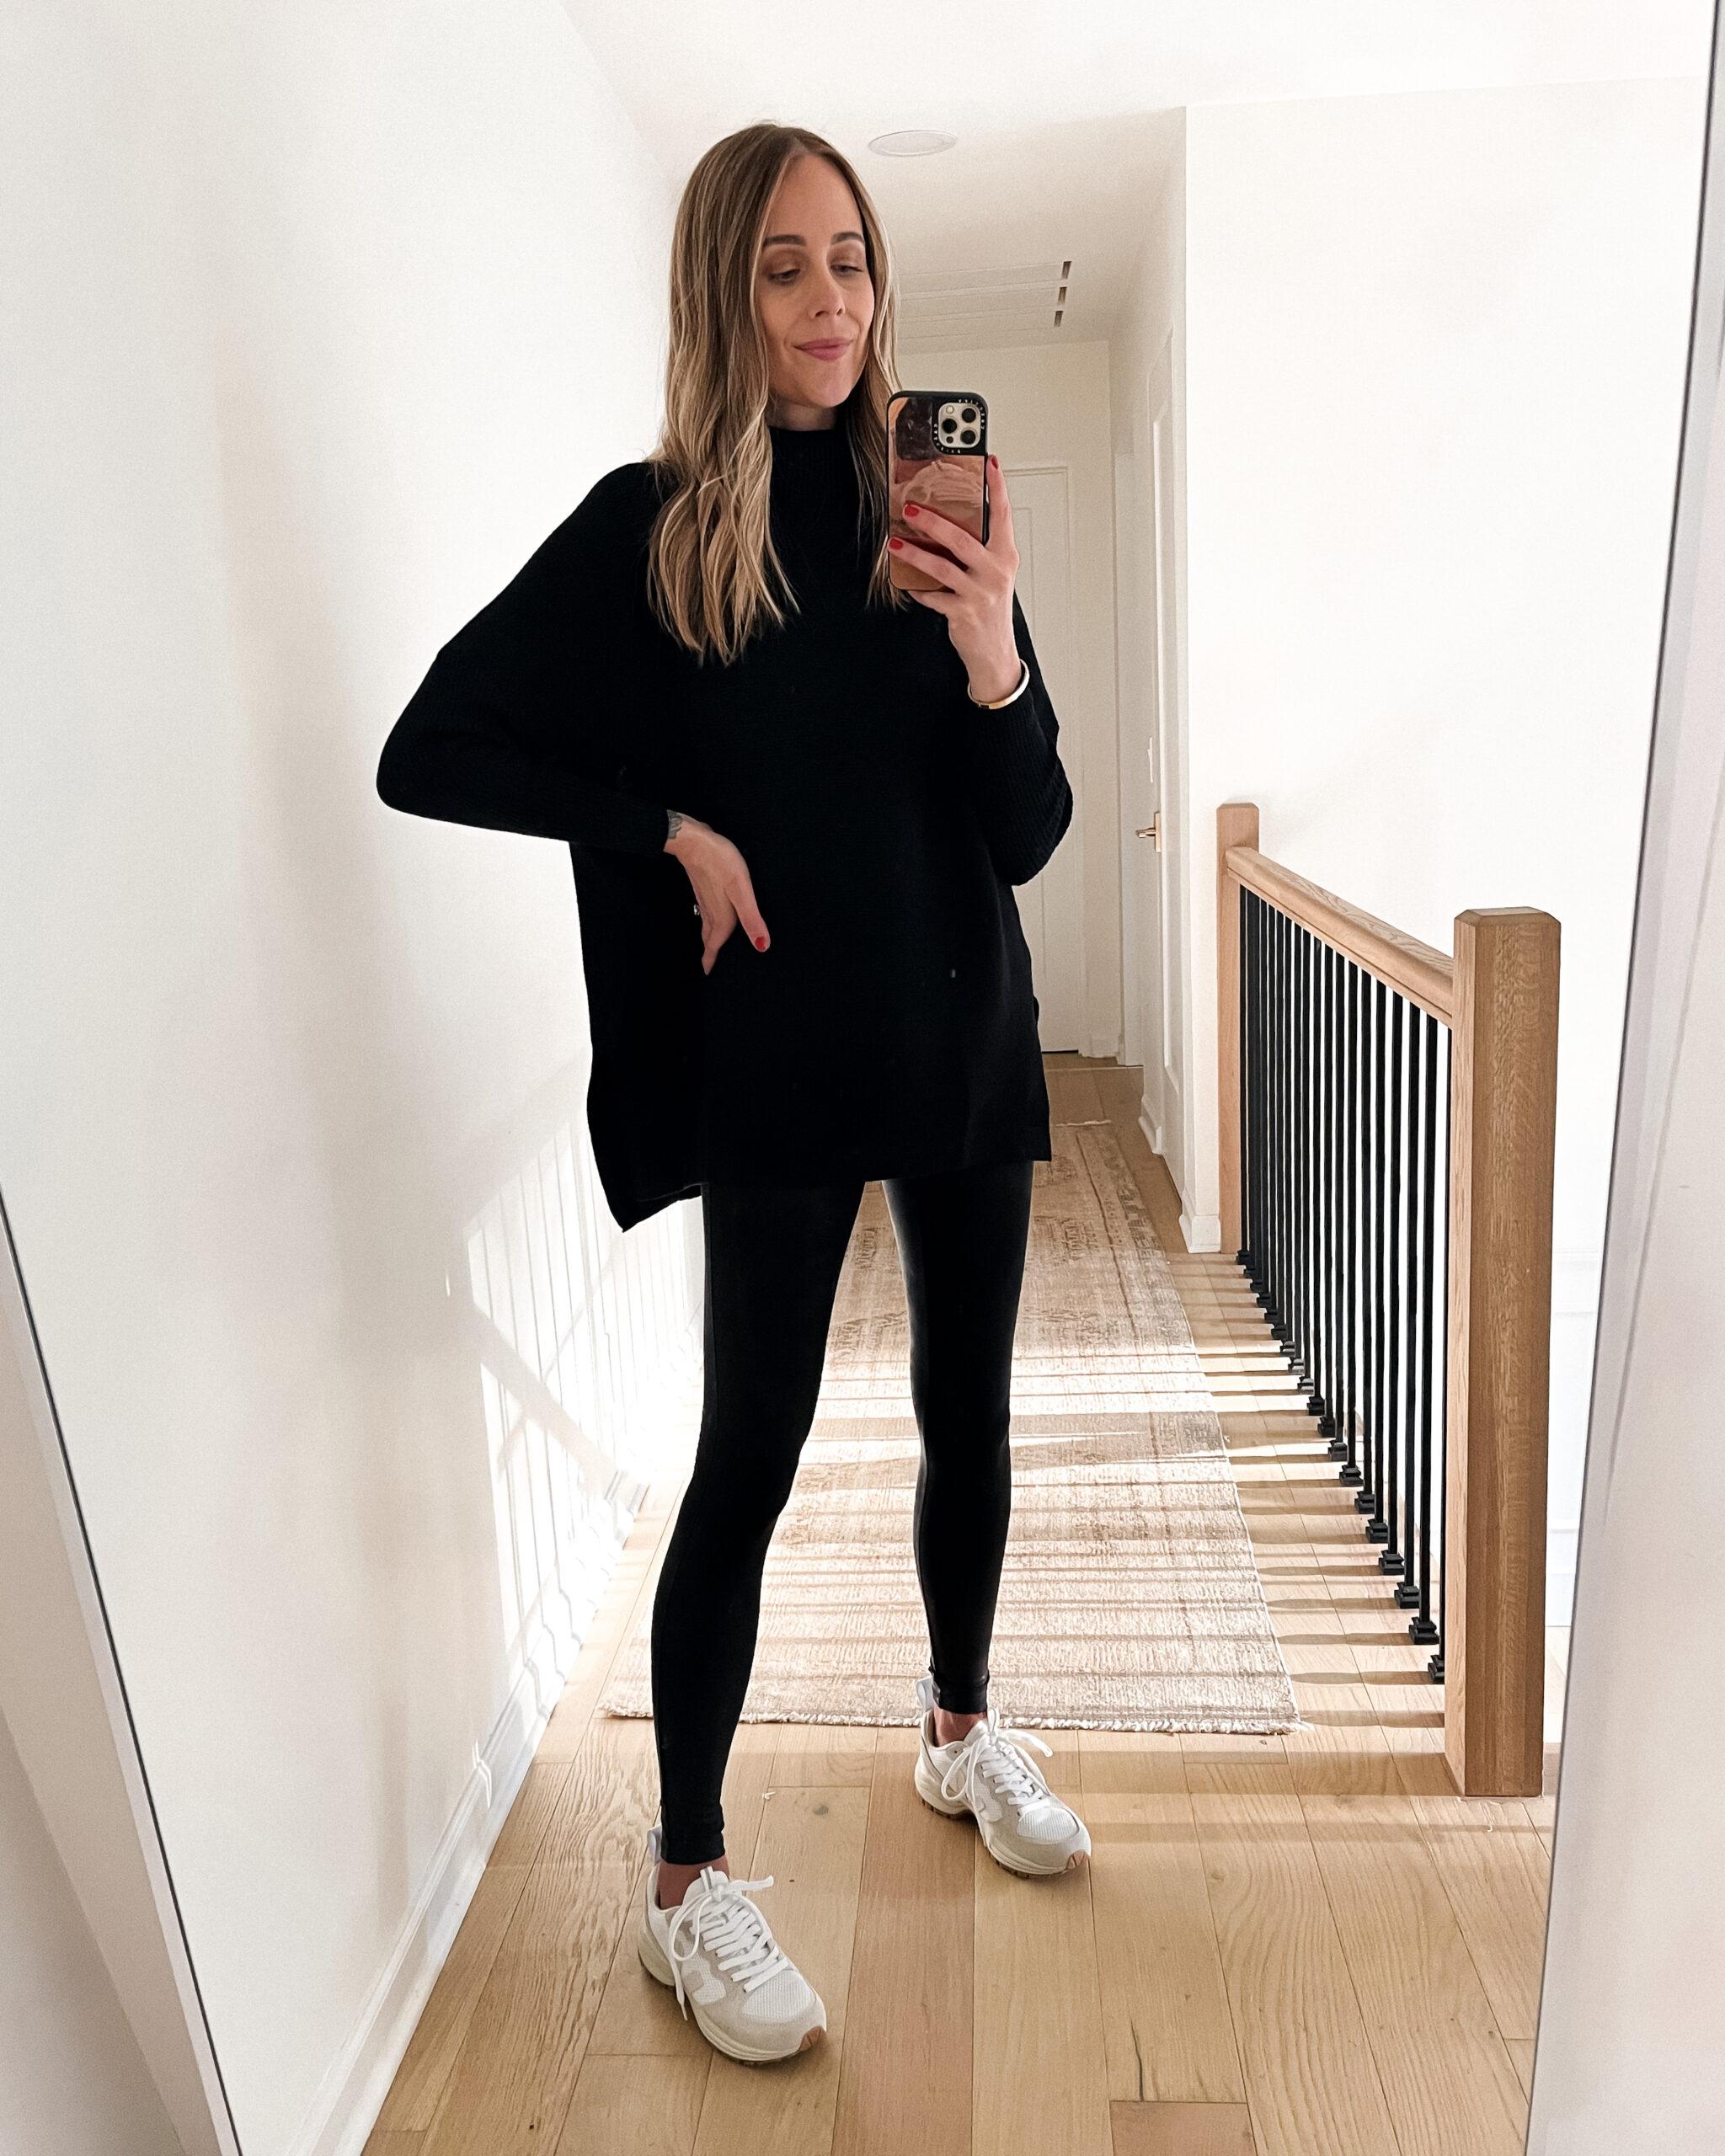 Fashion Jackson Wearing Amazon Fashion Black Tunic Turtleneck Sweater Black Leggings White Dad Sneakers